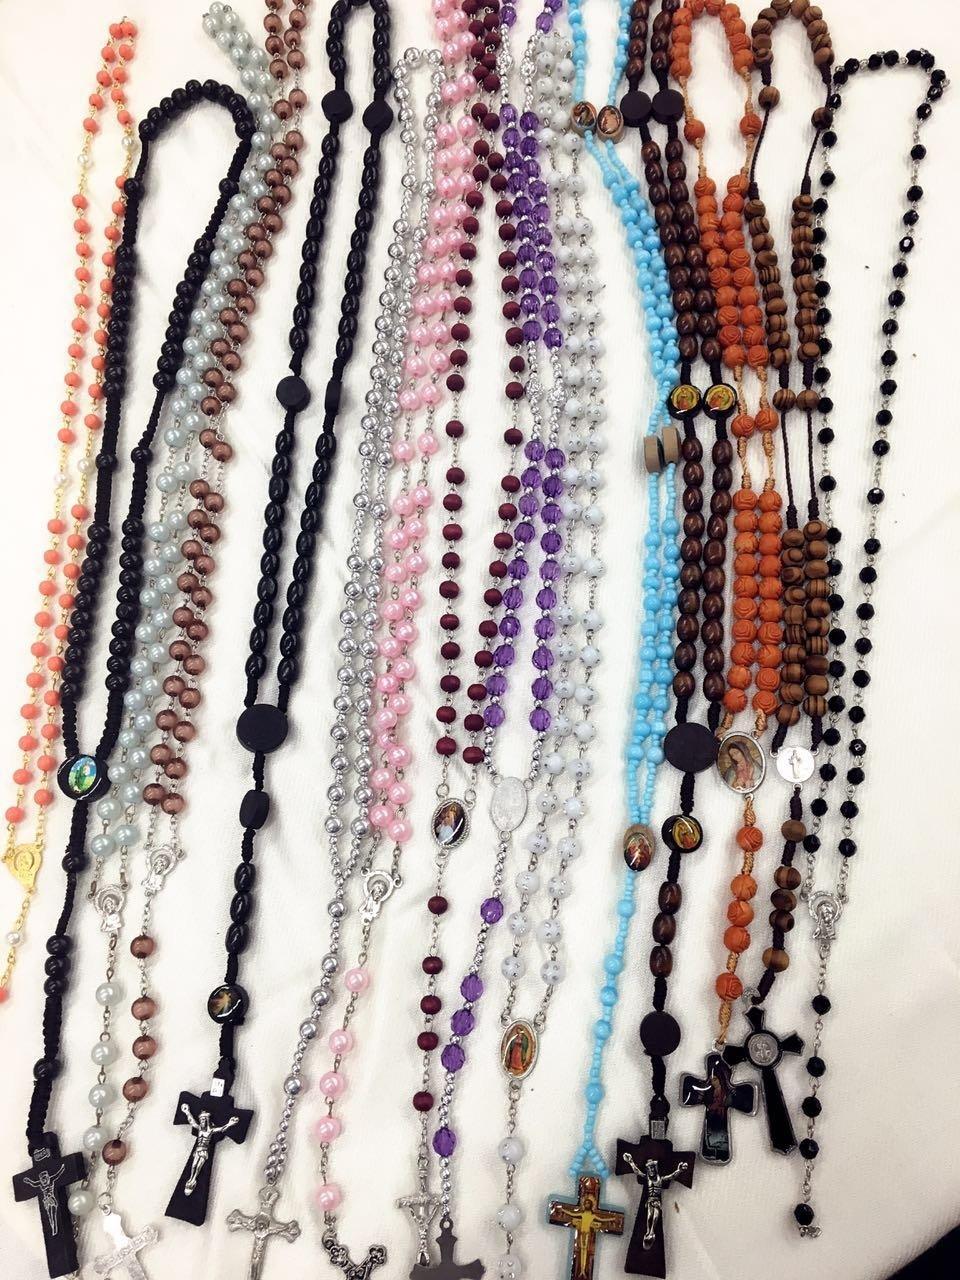 12pcs mix lot rosary necklace Religious catholic Crucifix cross wholesale lot